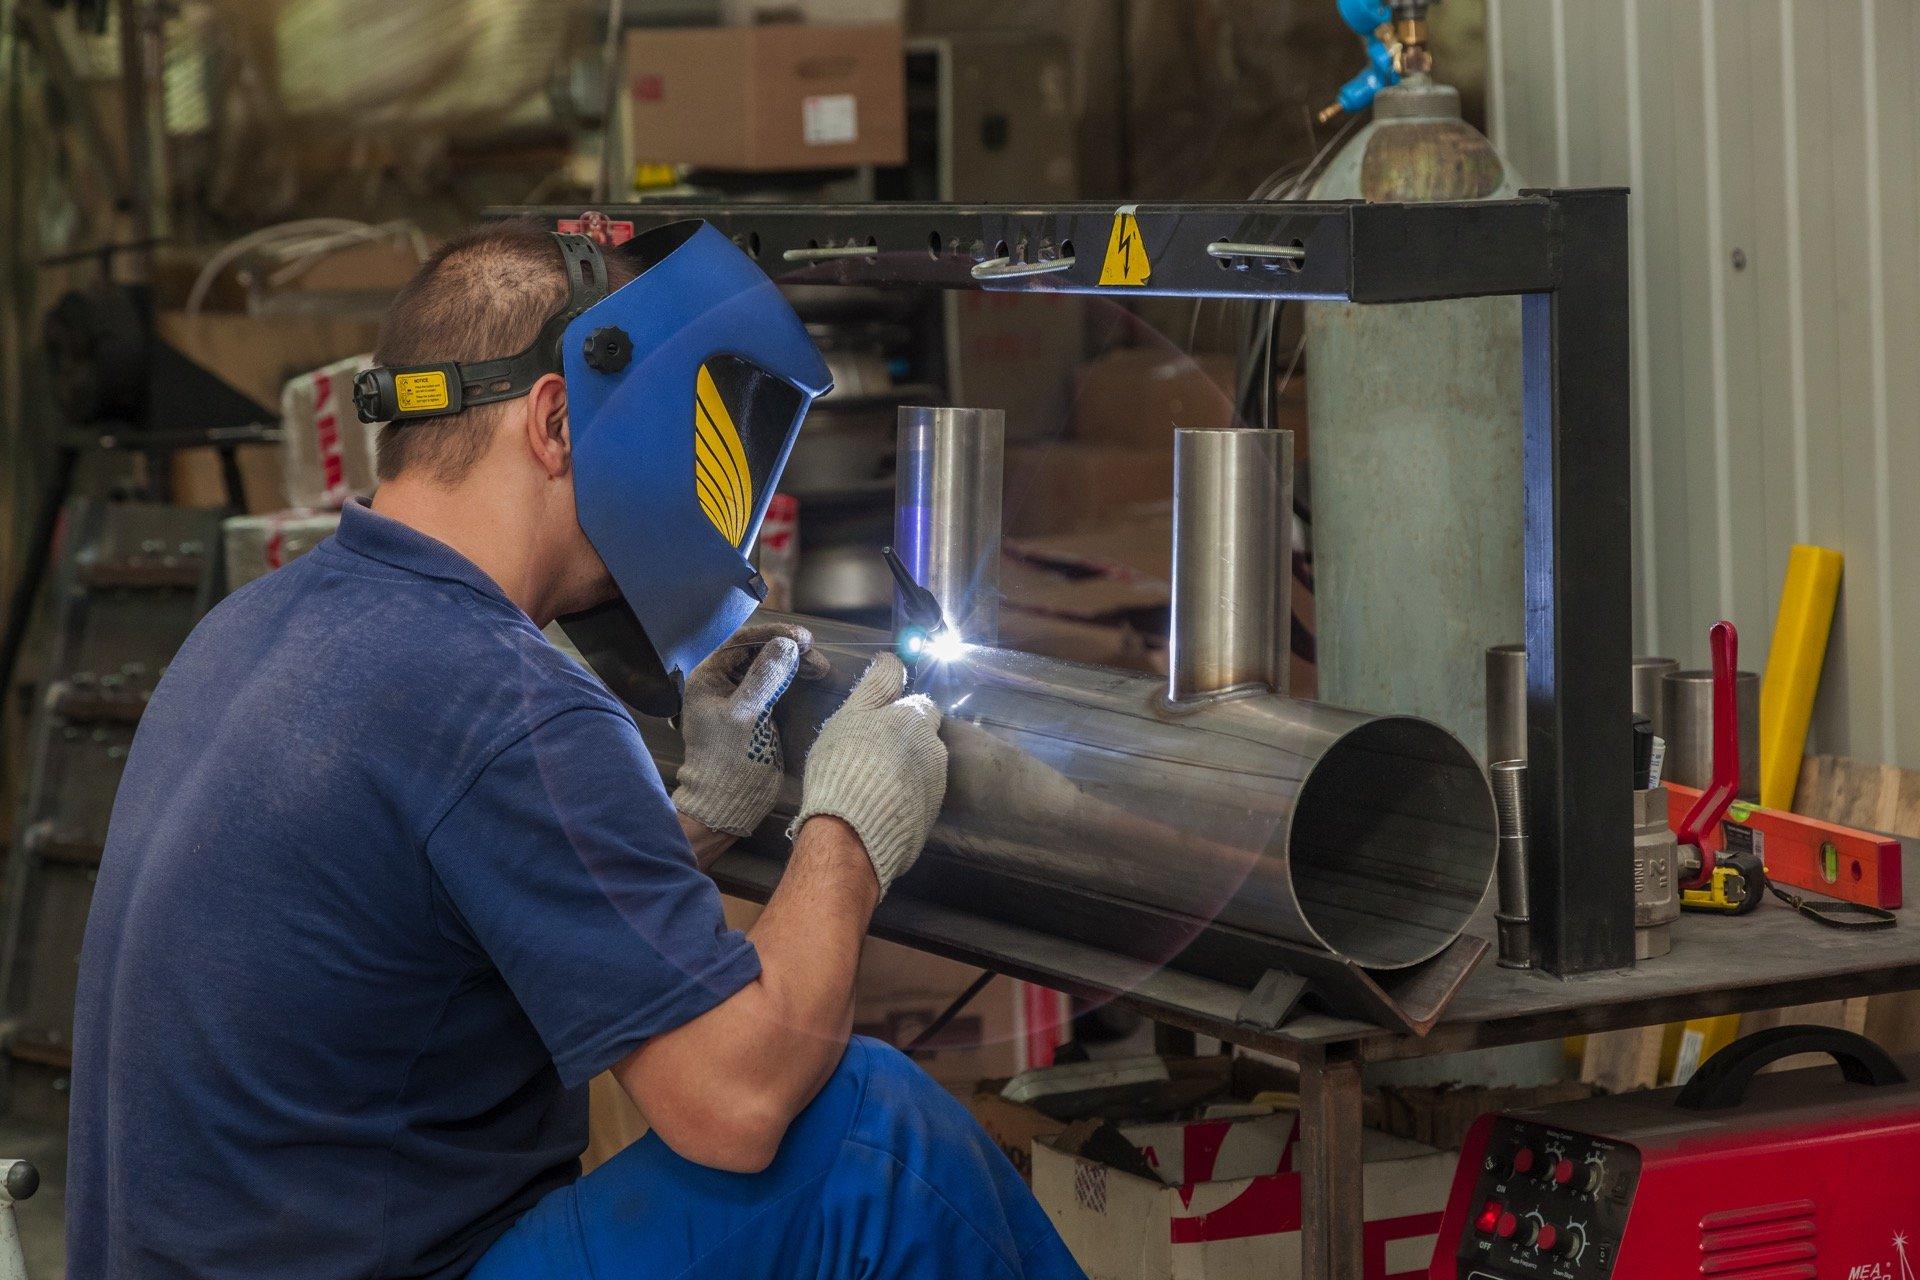 Welder welding stainless steel